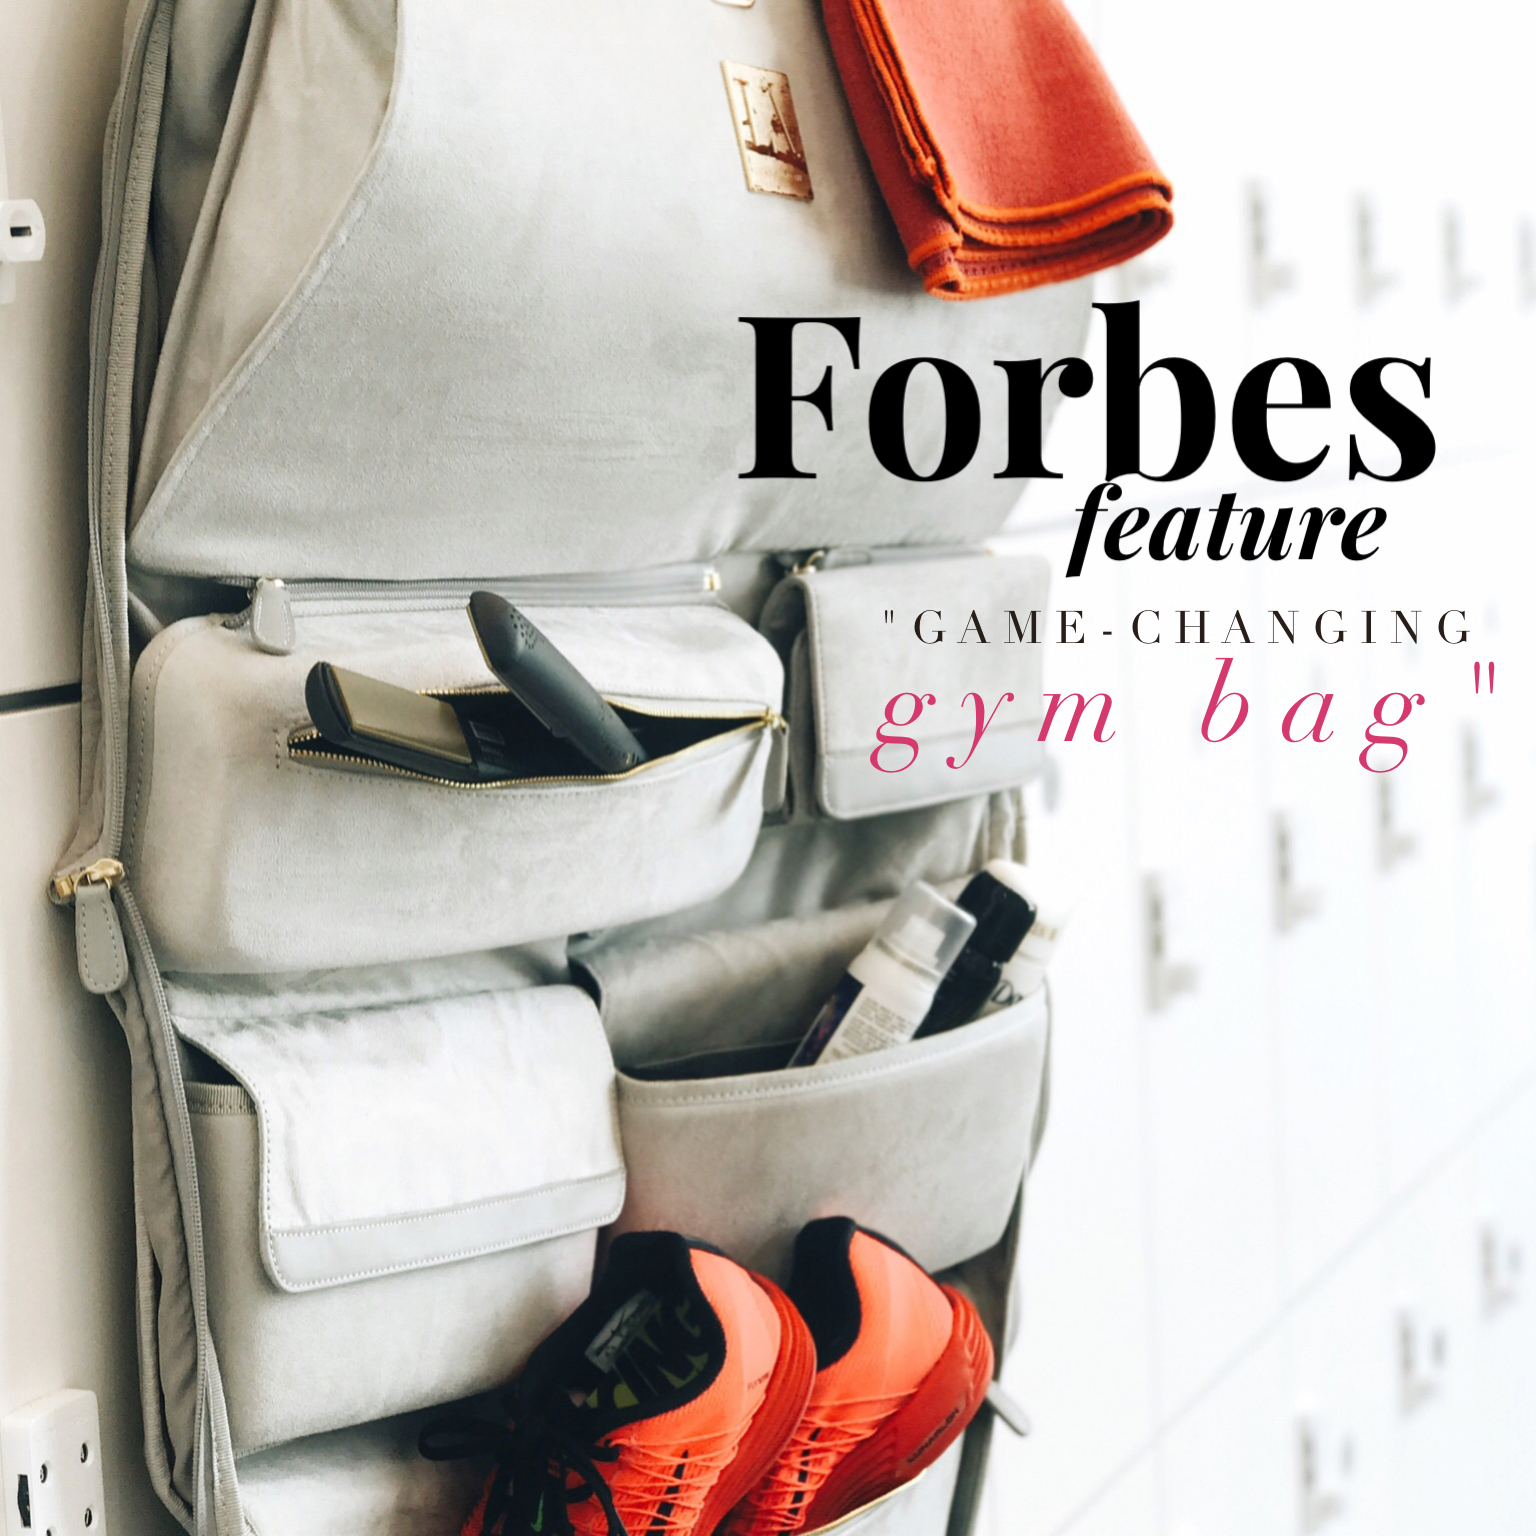 LA MOVE GYM BAG - Forbes - July 2017